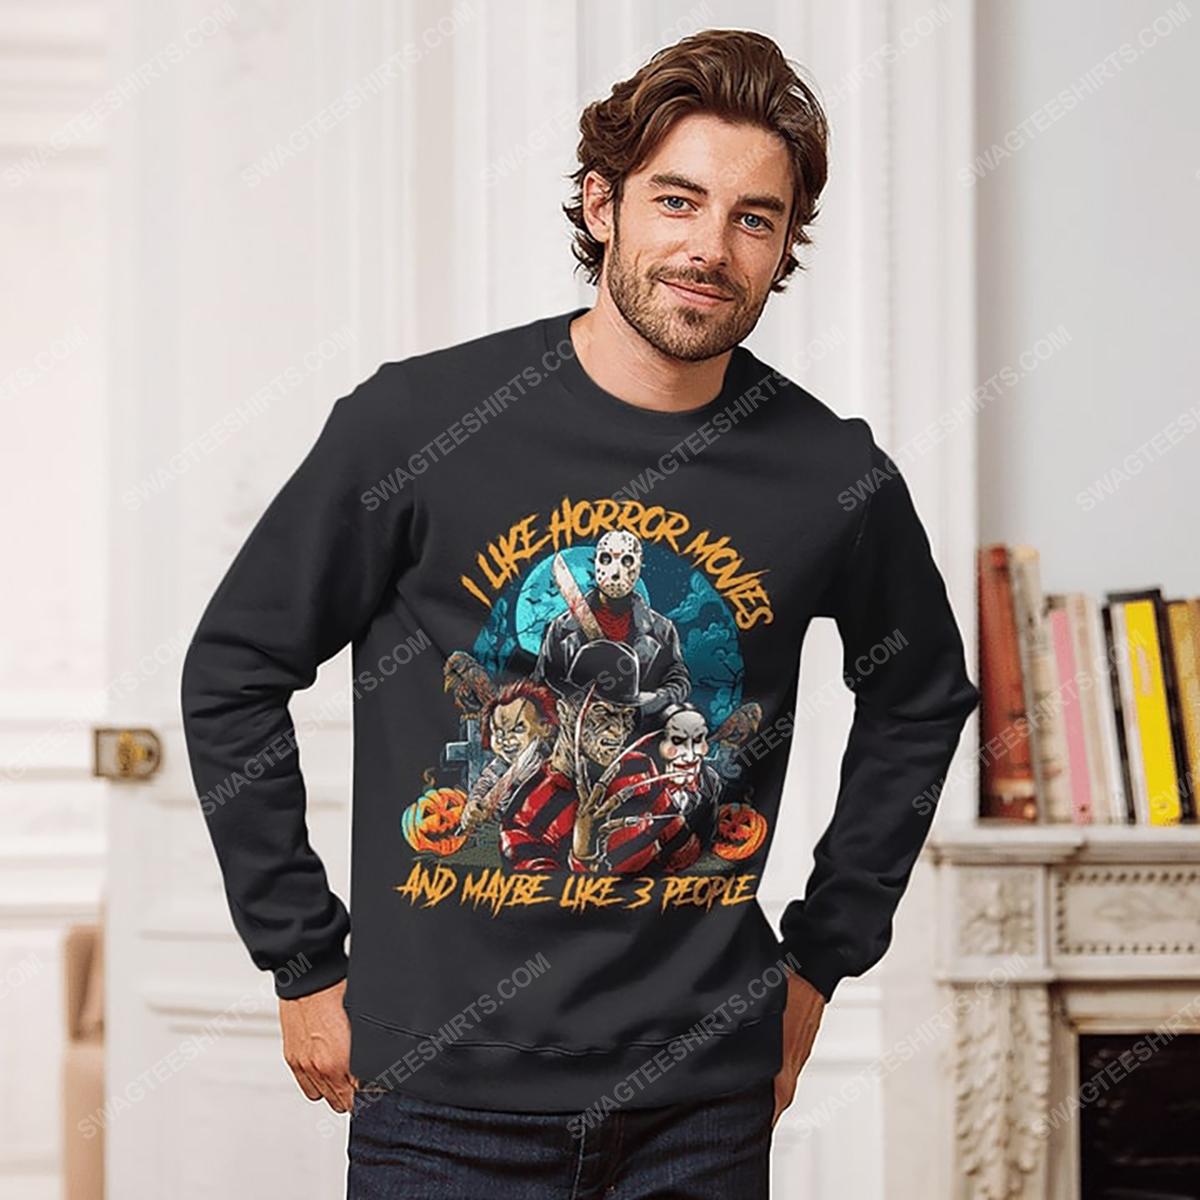 Halloween i like horror movies and maybe like 3 people sweatshirt 1(1)